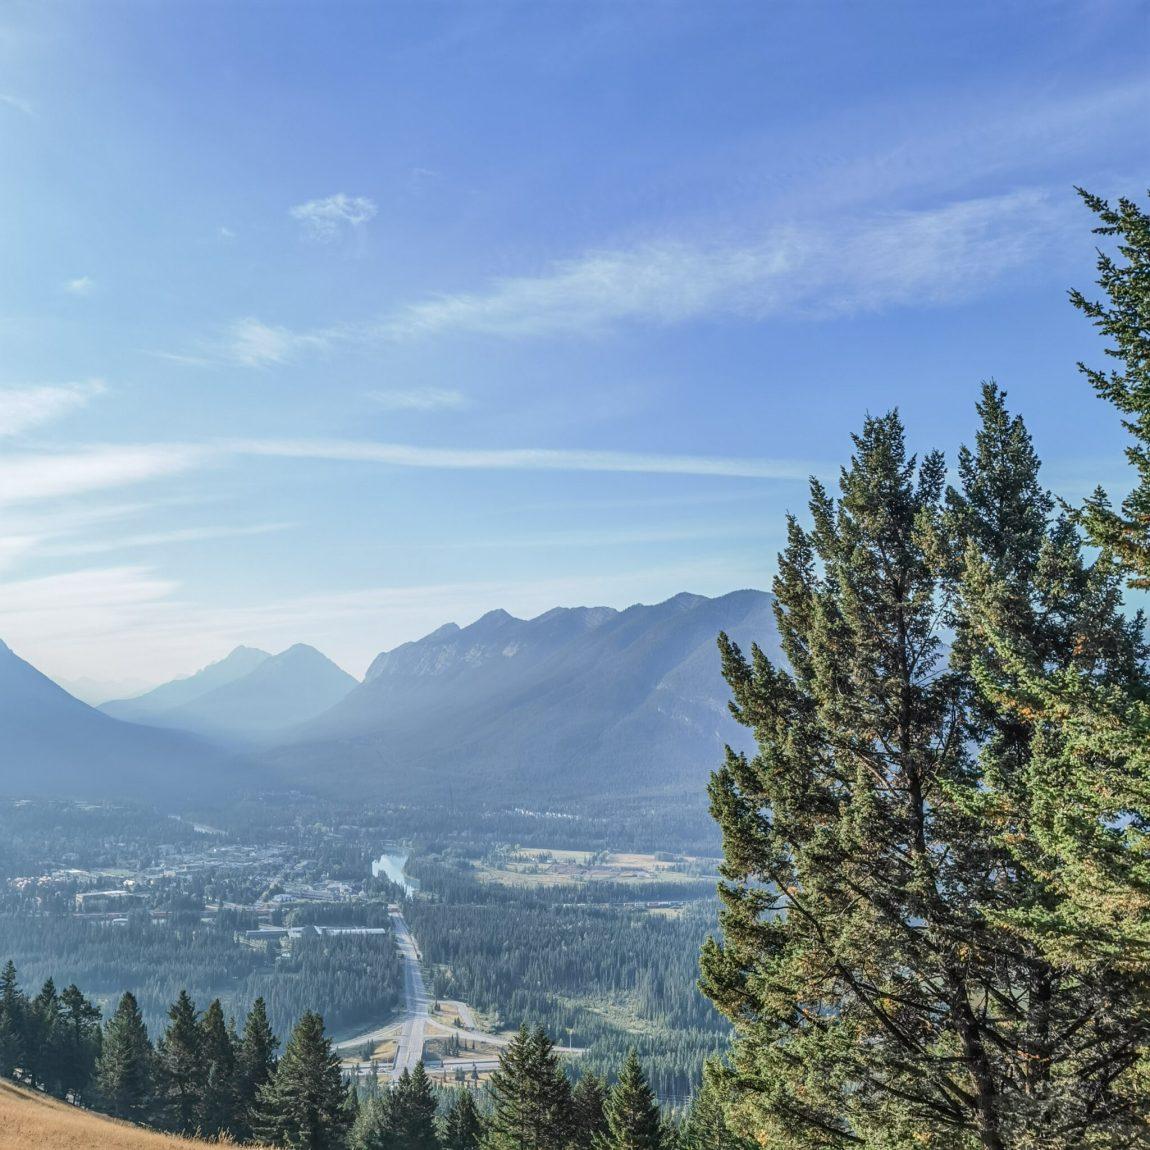 Mount Royal Hotel - Pursuit - Banff - Canadian Rockies - Open Top Touring - Views